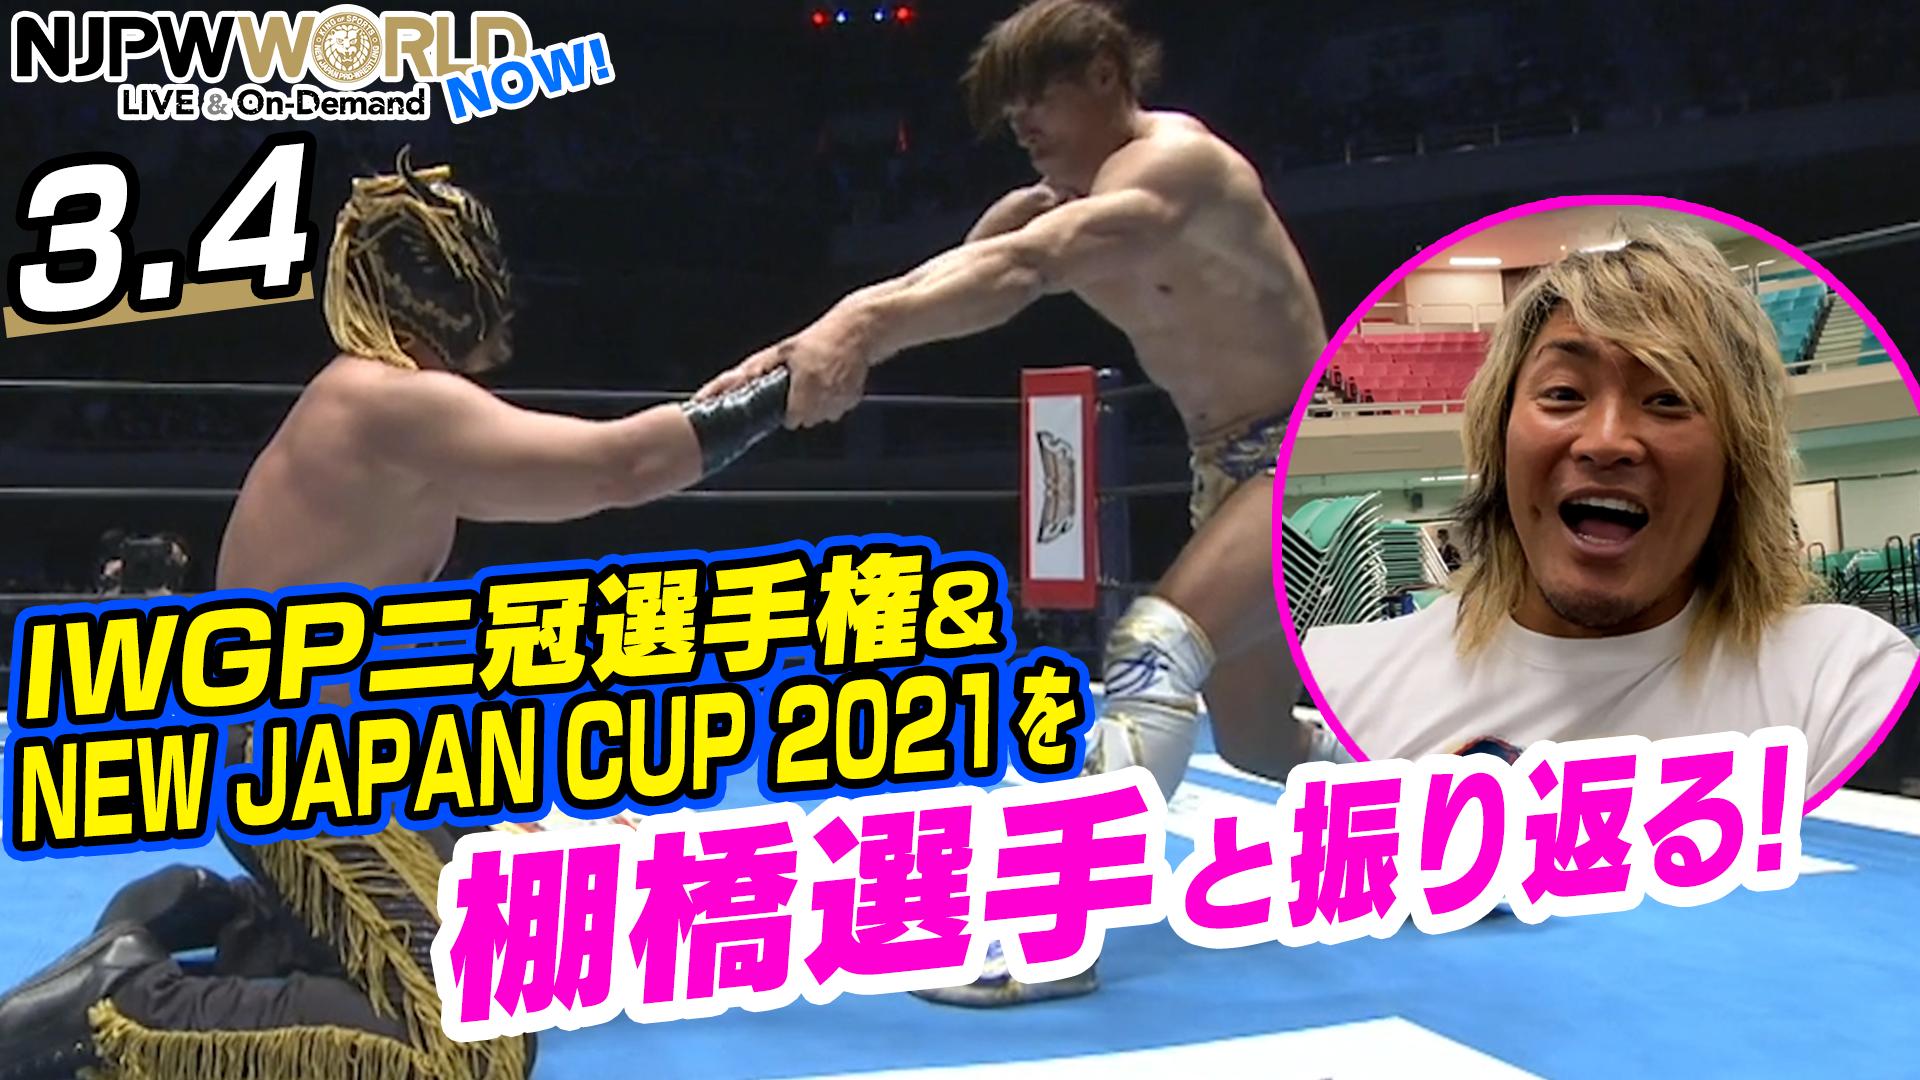 《IWGP二冠選手権》飯伏 vs デスペラード戦を棚橋選手と振り返る‼️ NJPWWORLD NOW!